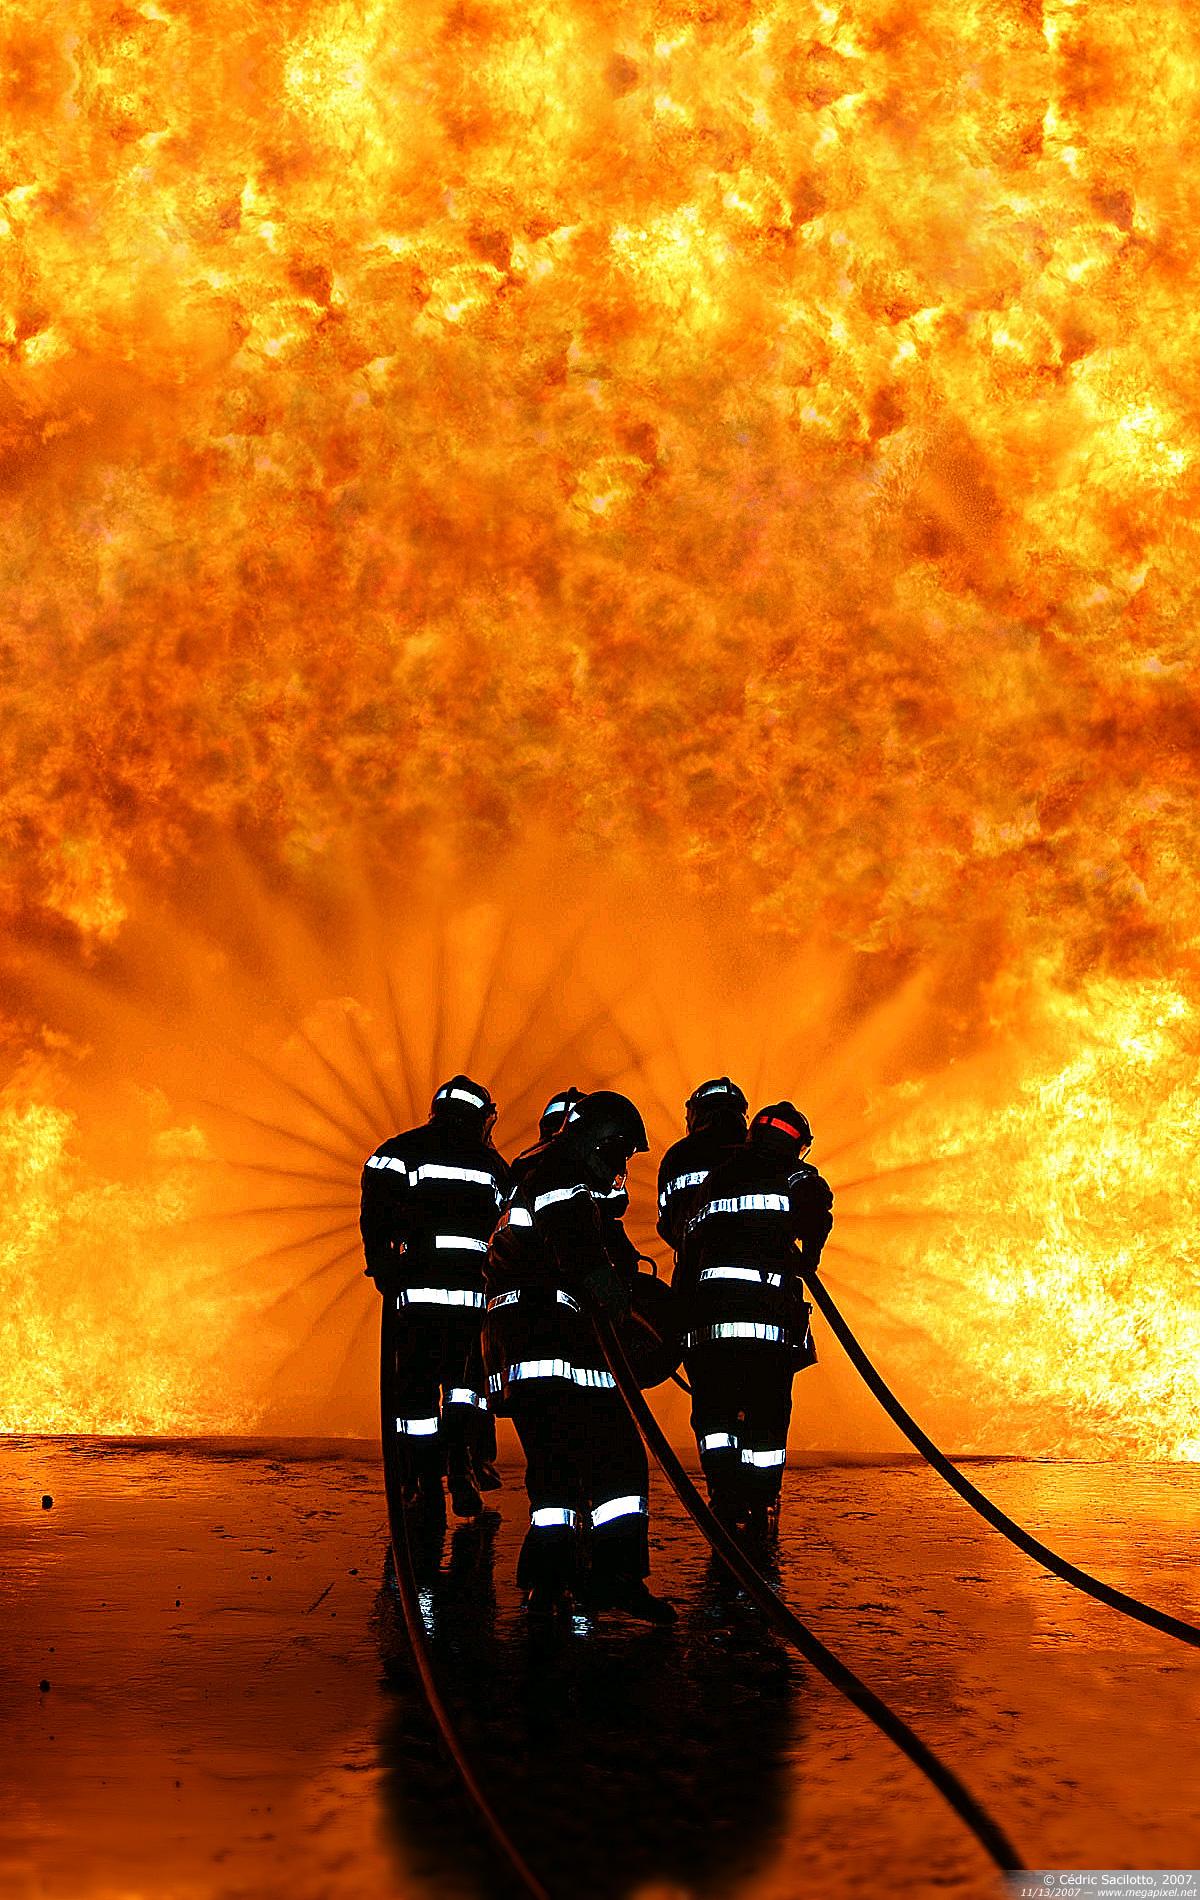 1920x1080 wallpaper.wiki-Wonderful-Firefighter-Wallpaper-PIC-WPB004858